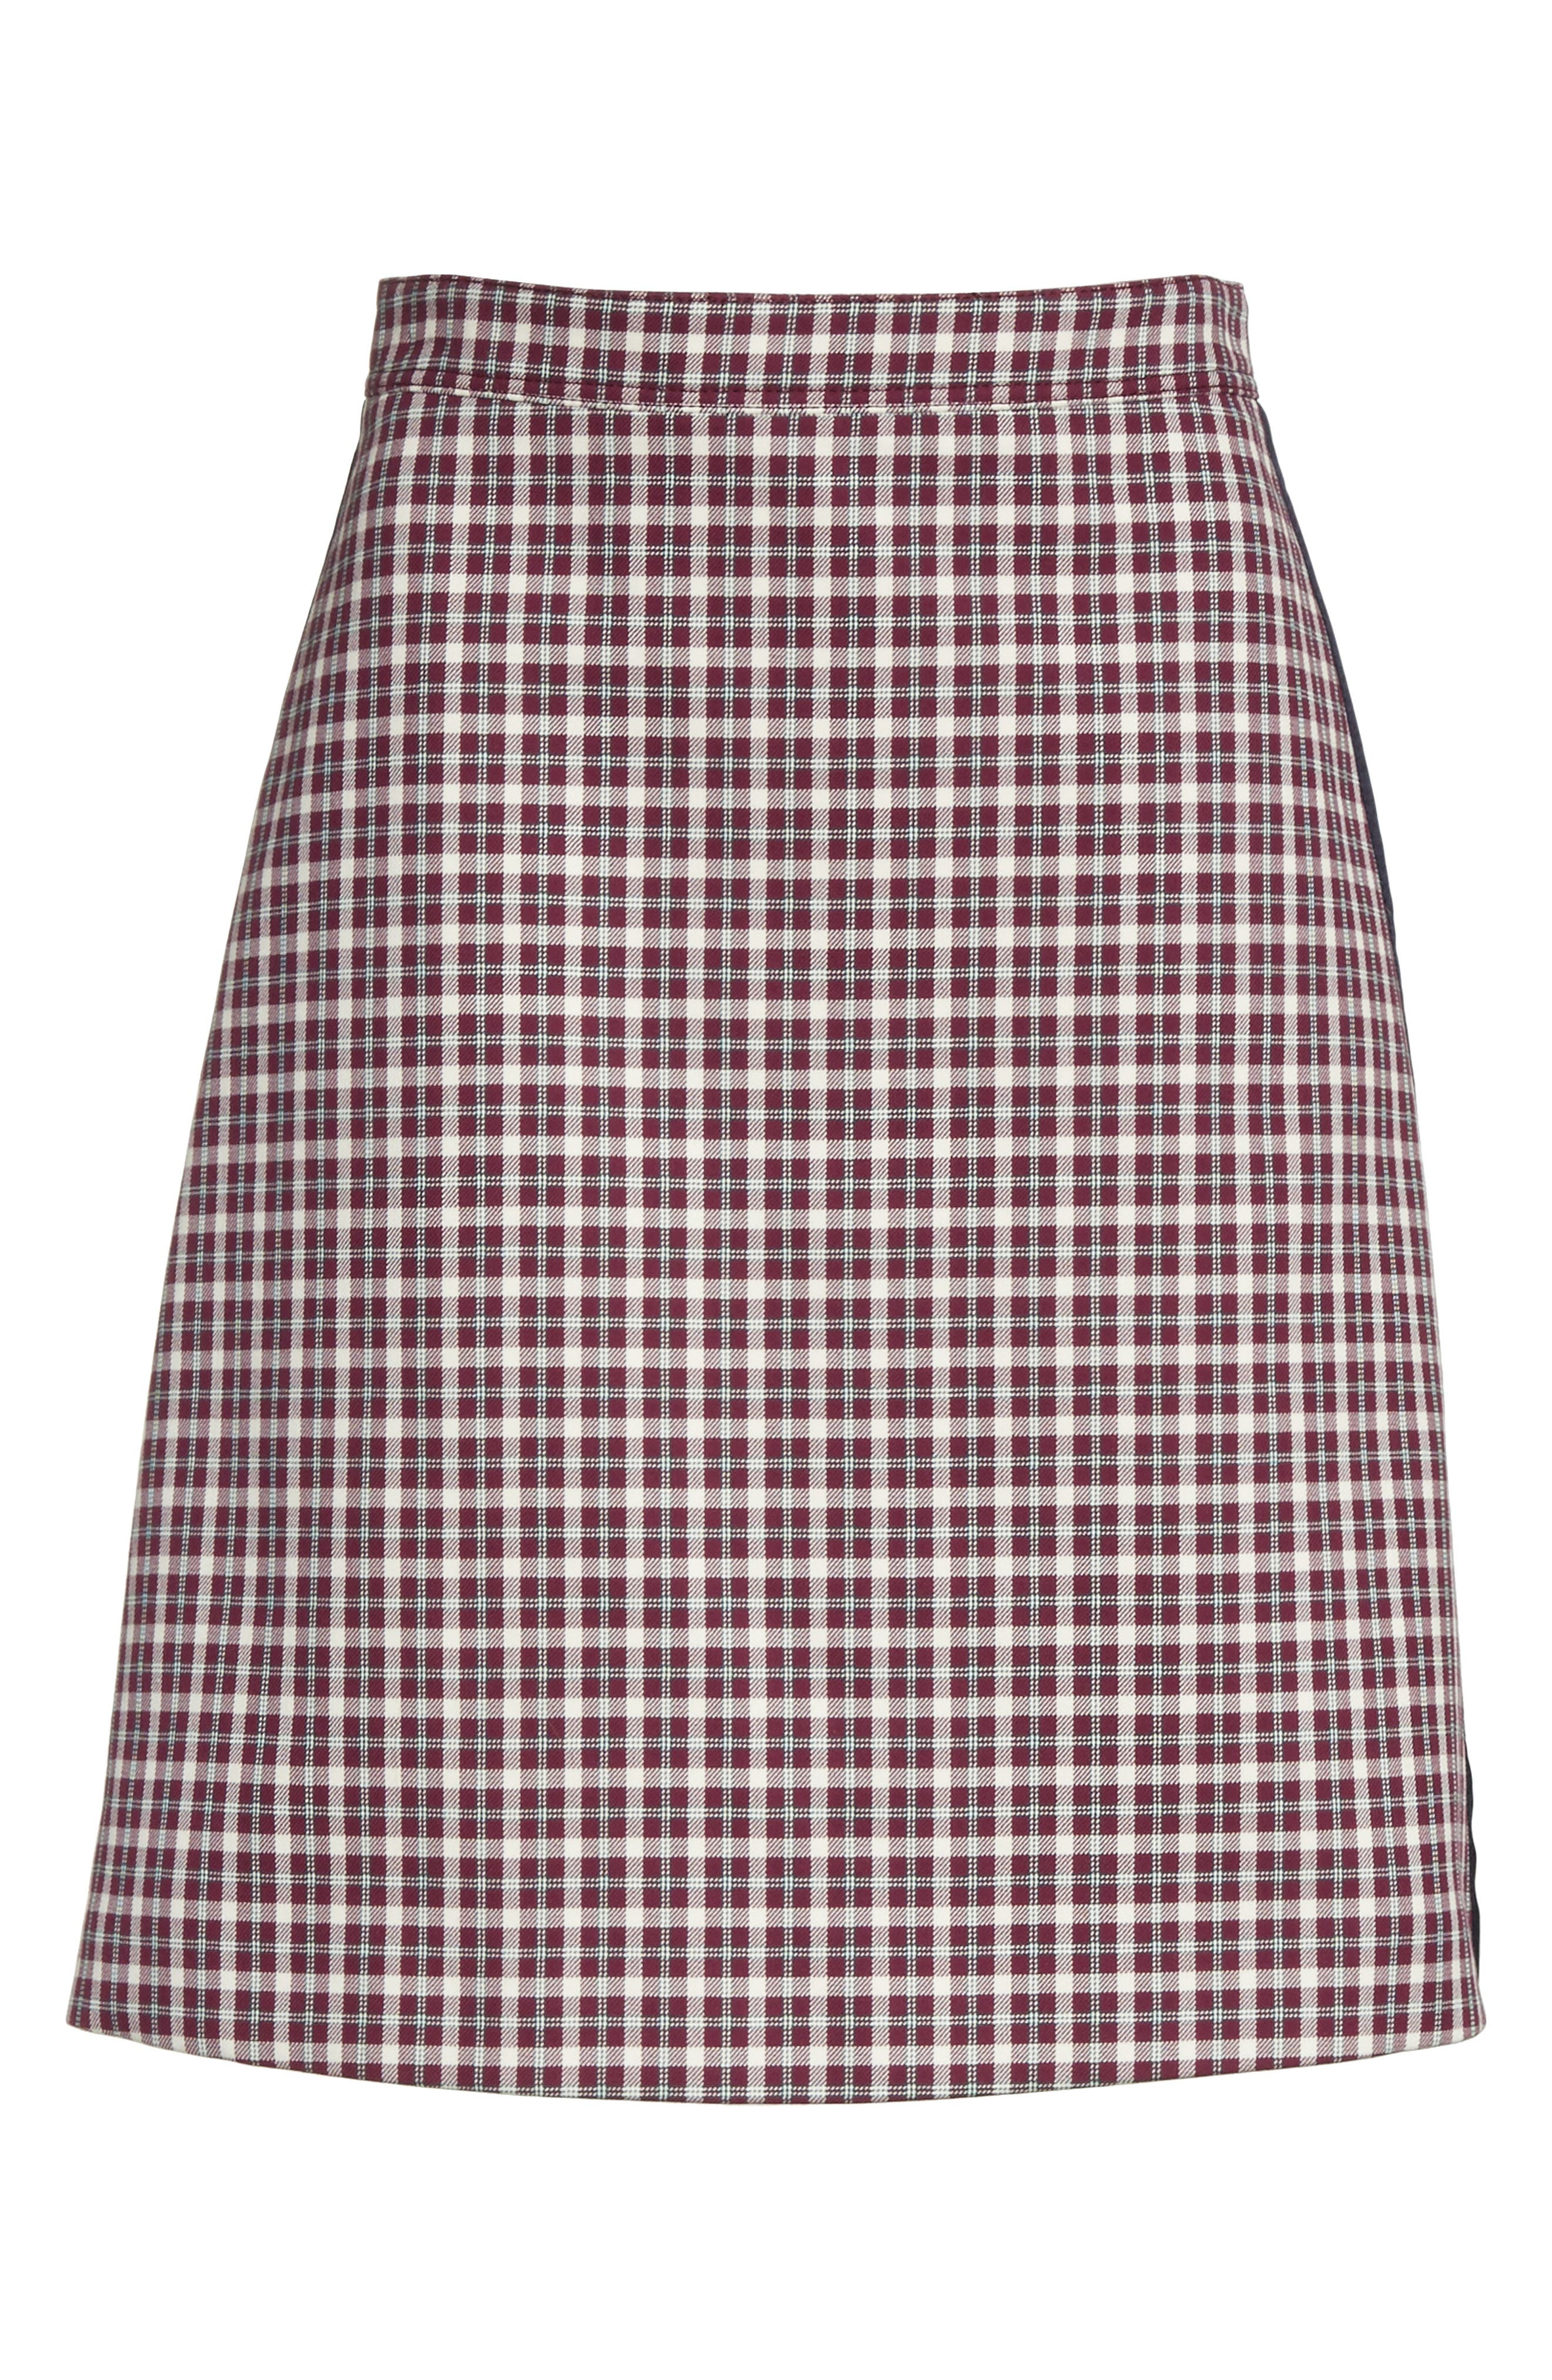 Stanforth Plaid A-Line Skirt,                             Alternate thumbnail 6, color,                             931